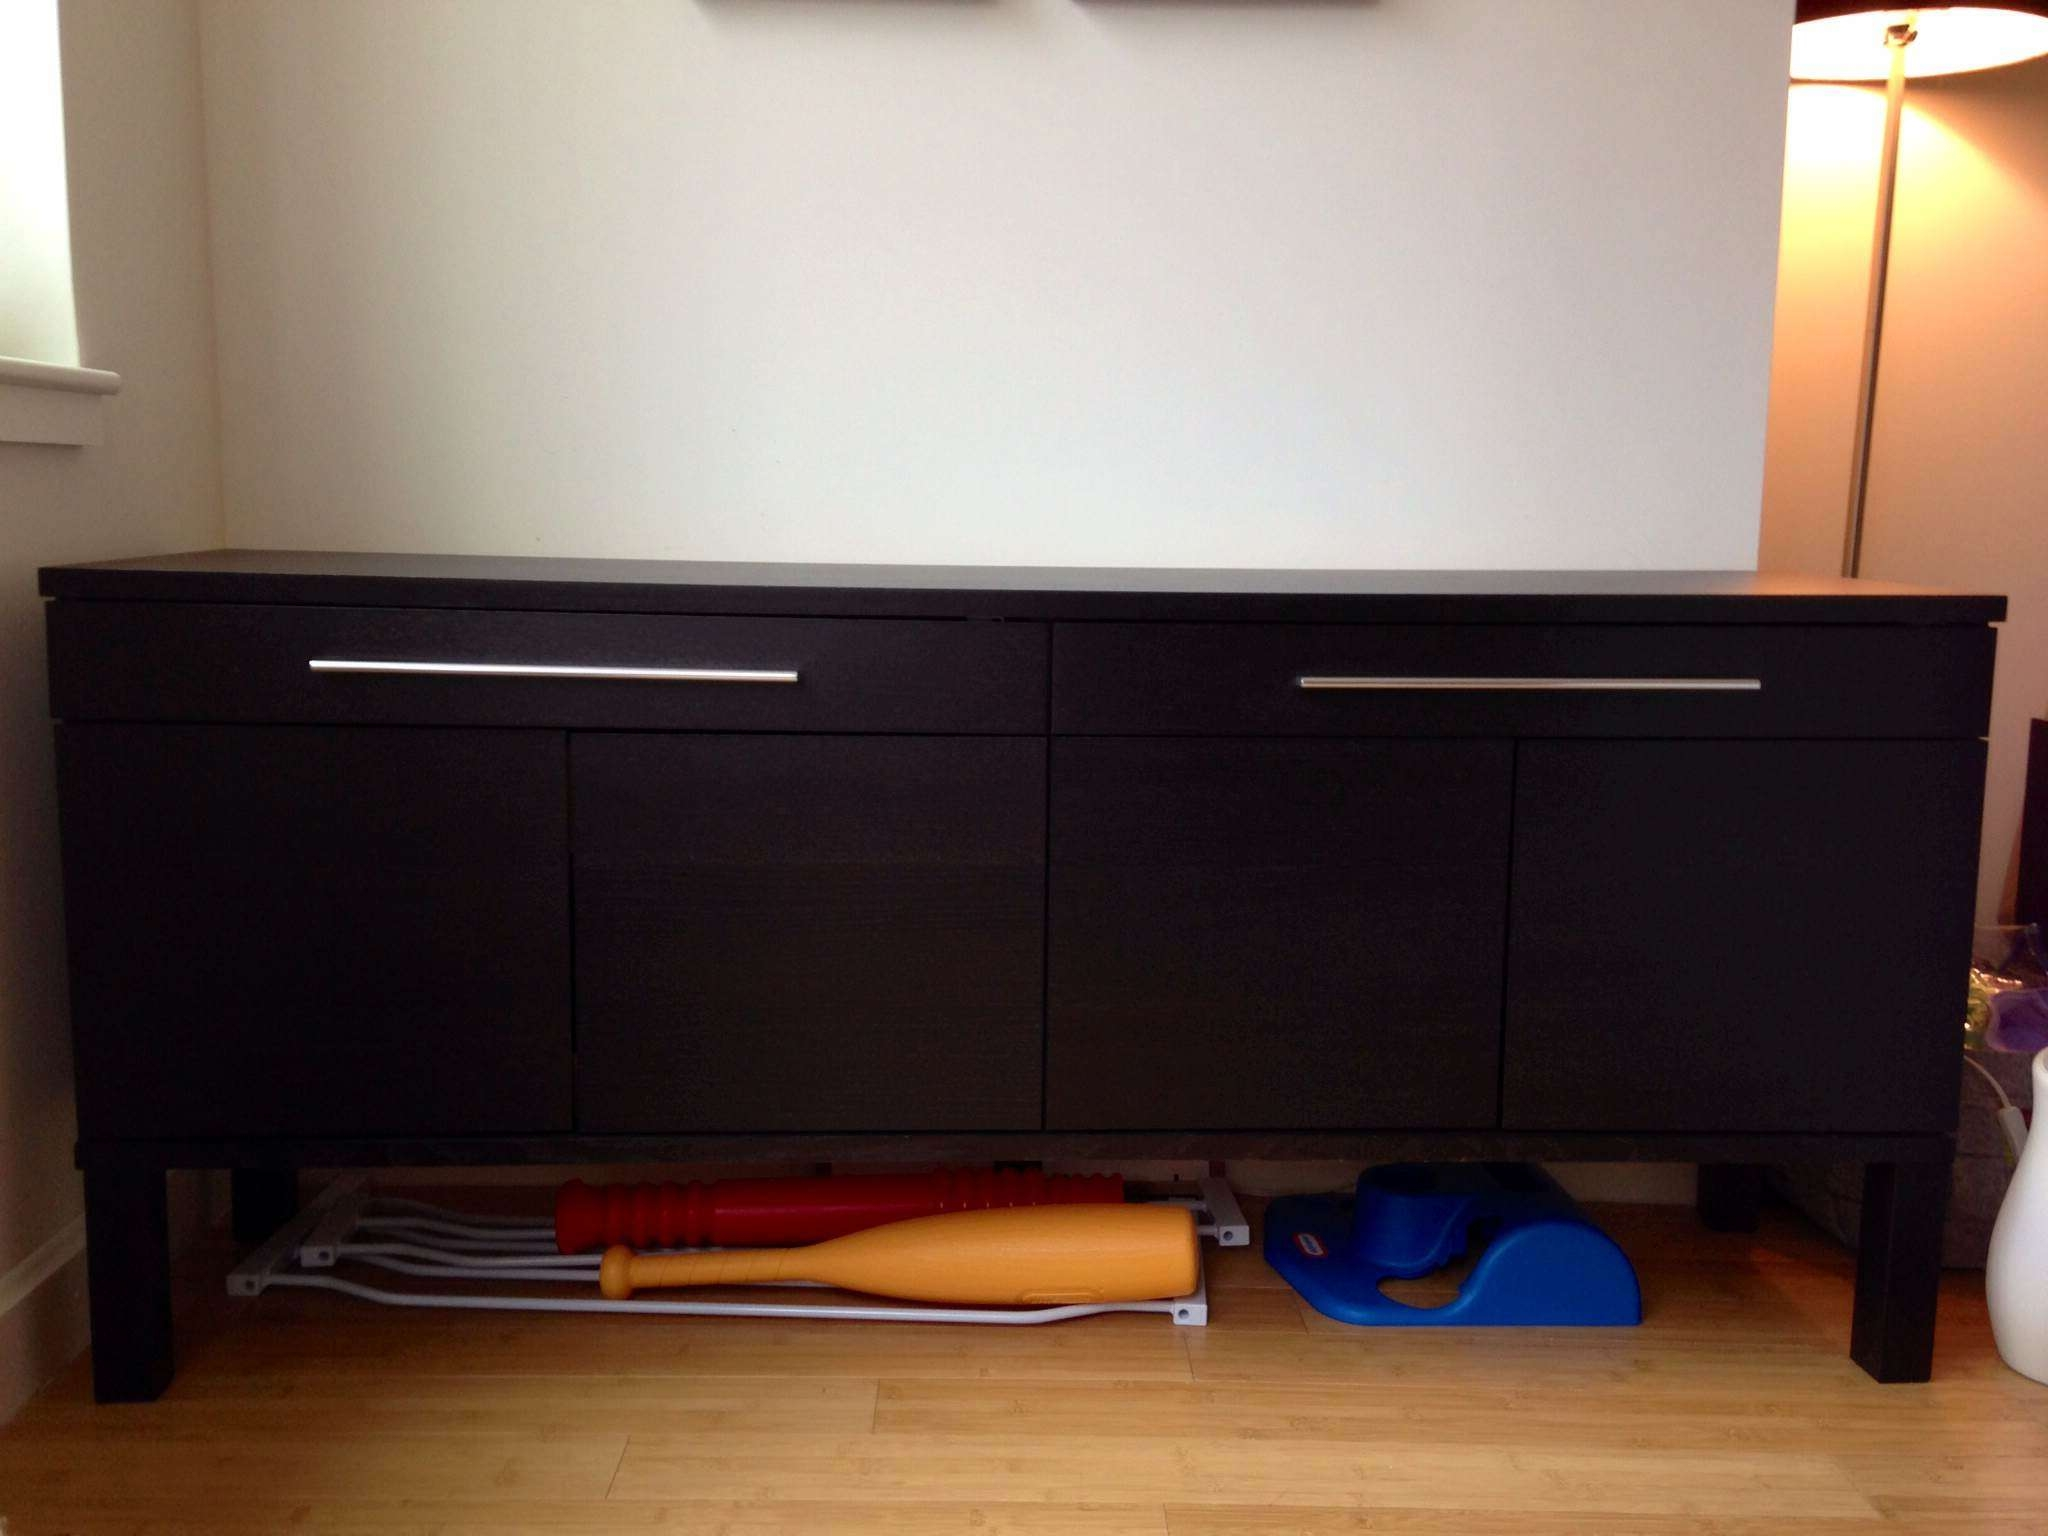 Ikea Bjursta Sideboard Dining Storage, Dark Brown – $100 | Too Big With Bjursta Sideboards (View 2 of 20)